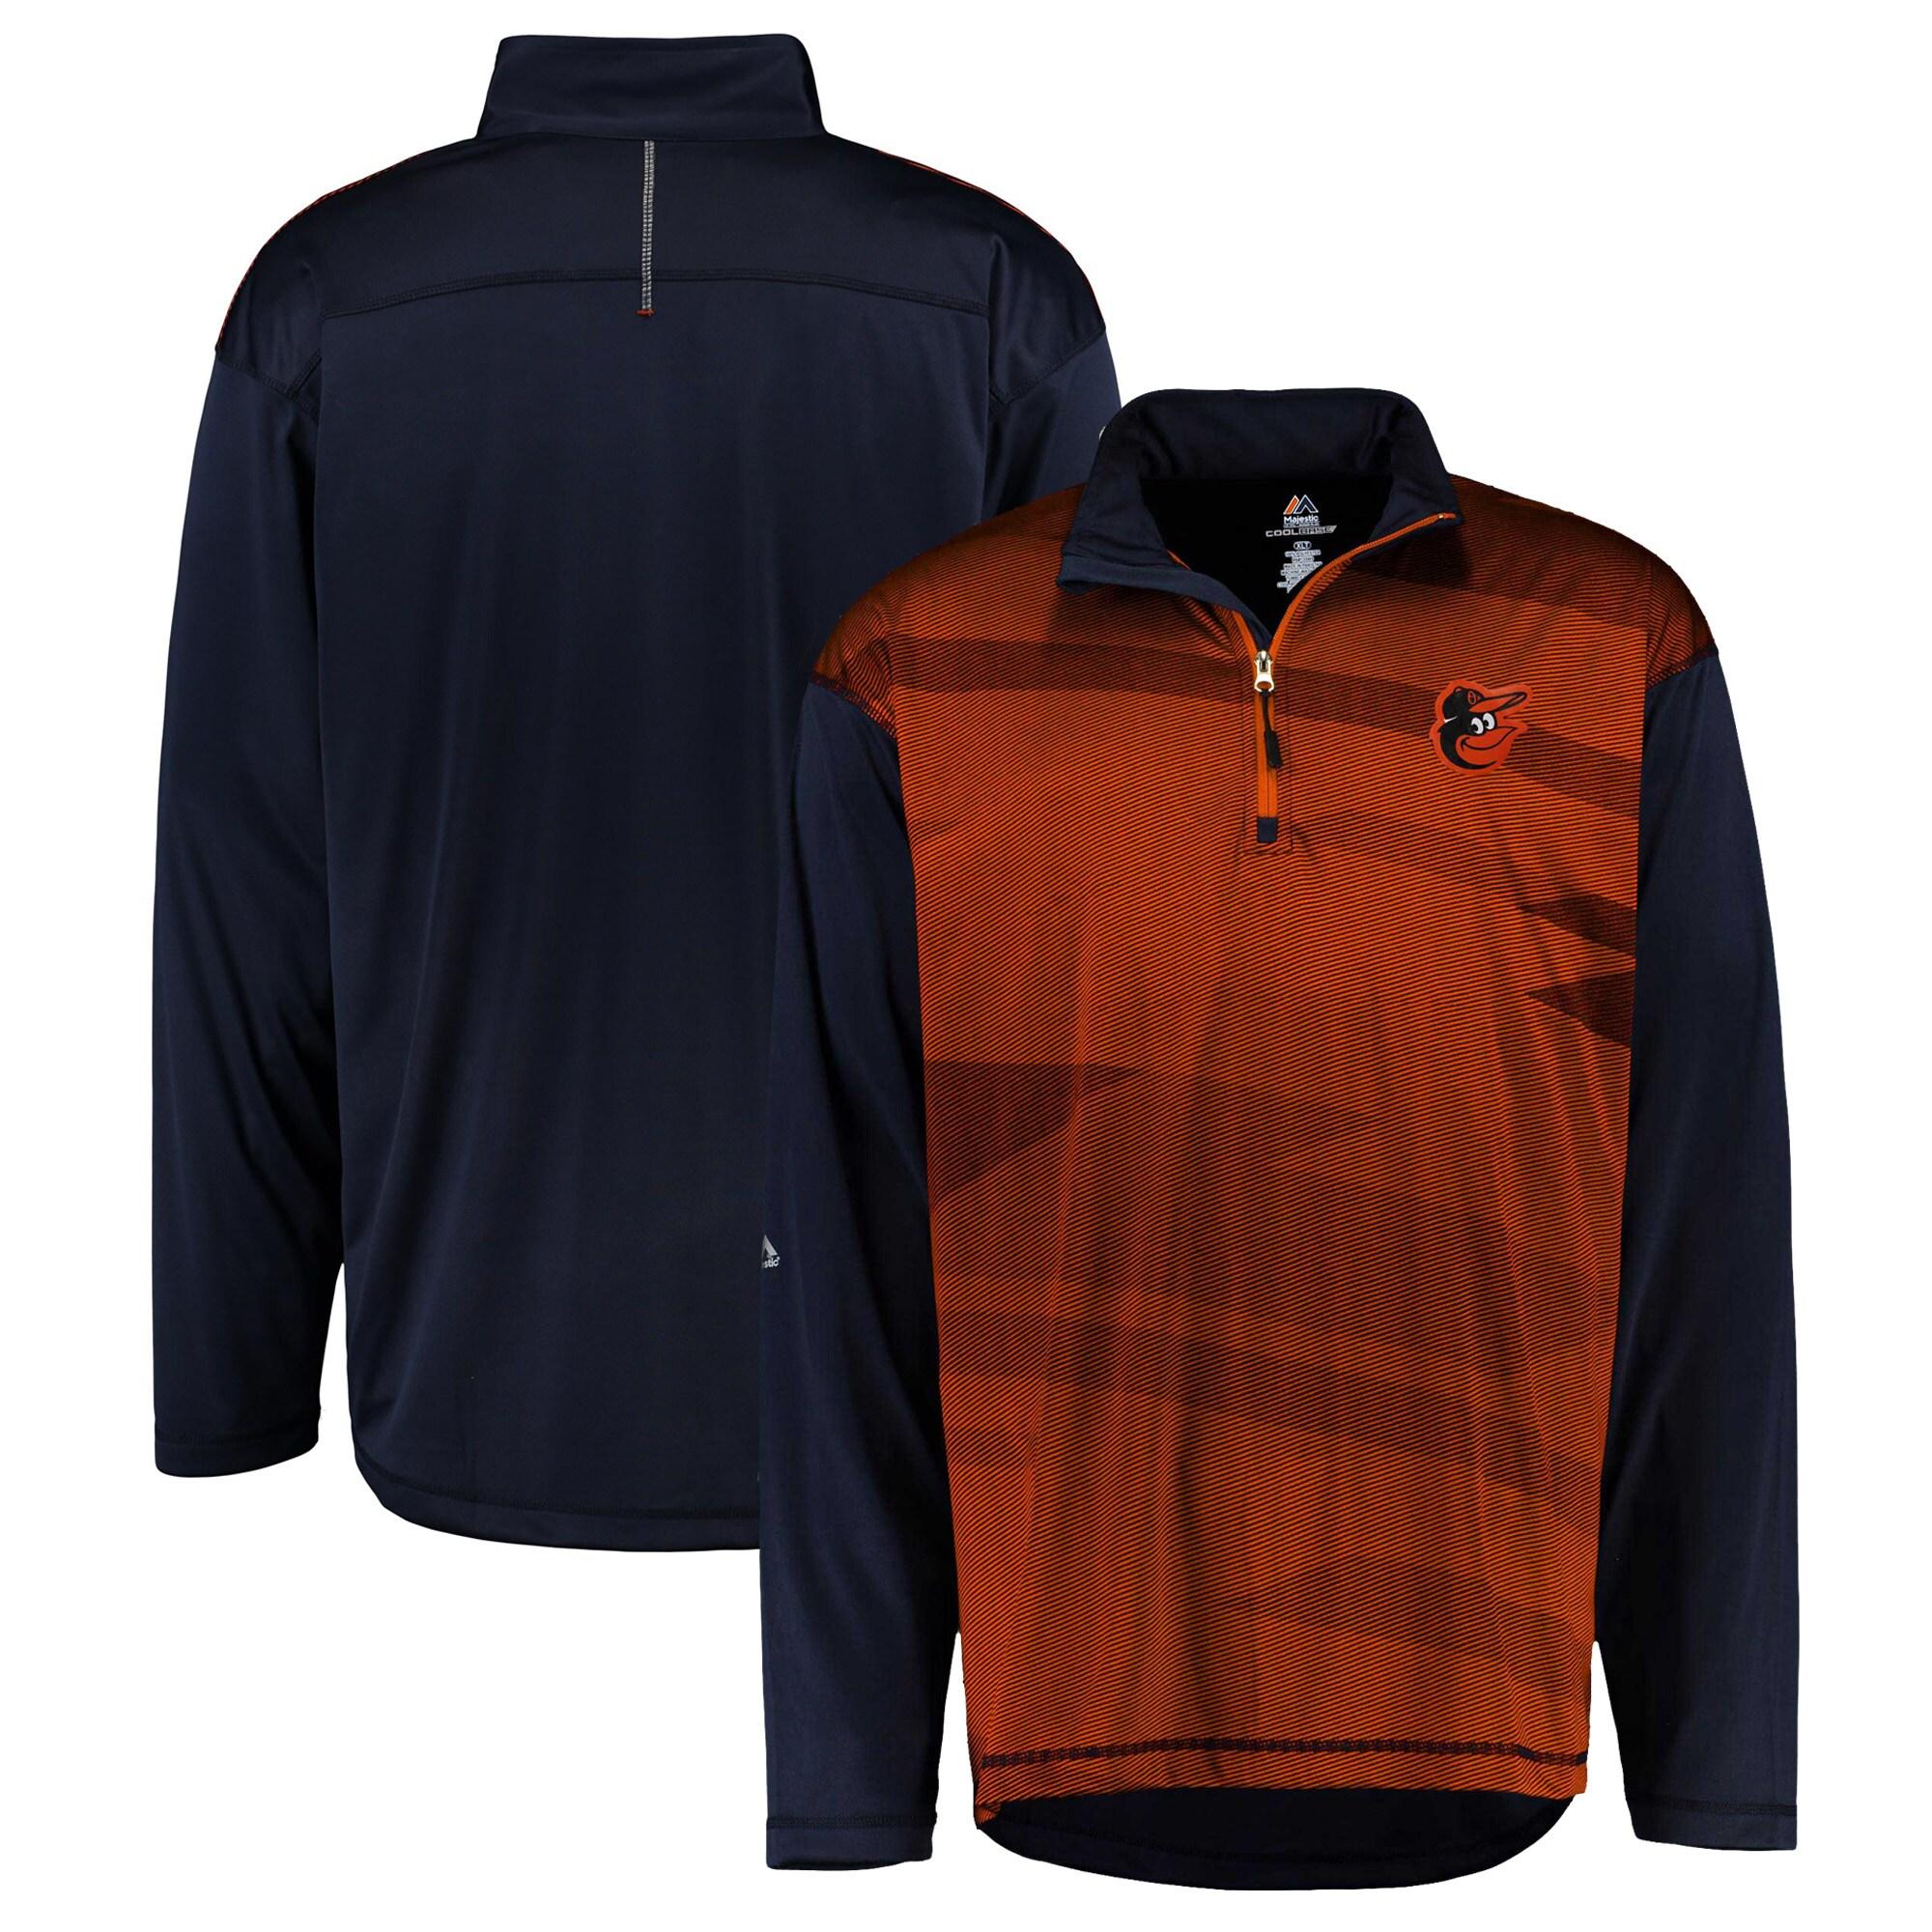 Baltimore Orioles Majestic Big & Tall Cool Base Quarter-Zip Sweatshirt - Black/Orange